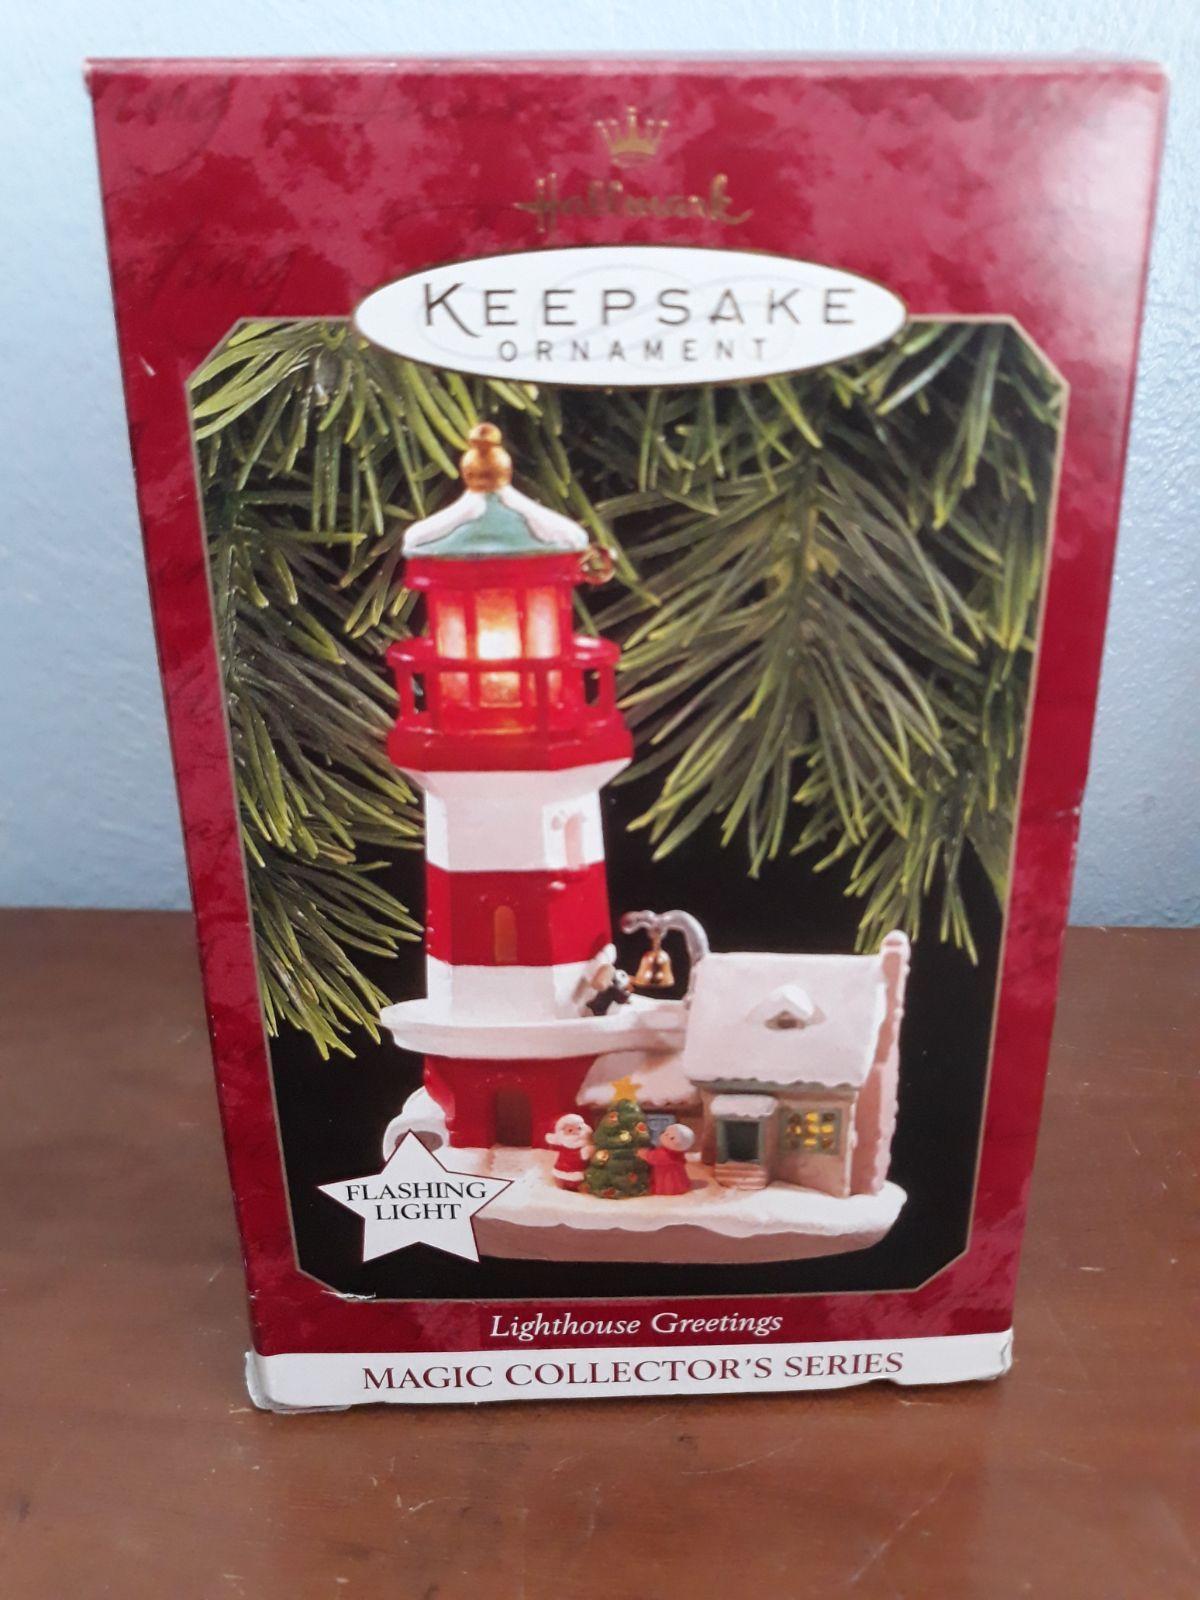 Still In Box Hallmark Keepsake Ornament Hallmark Keepsake Ornaments Keepsake Ornaments Hallmark Ornaments